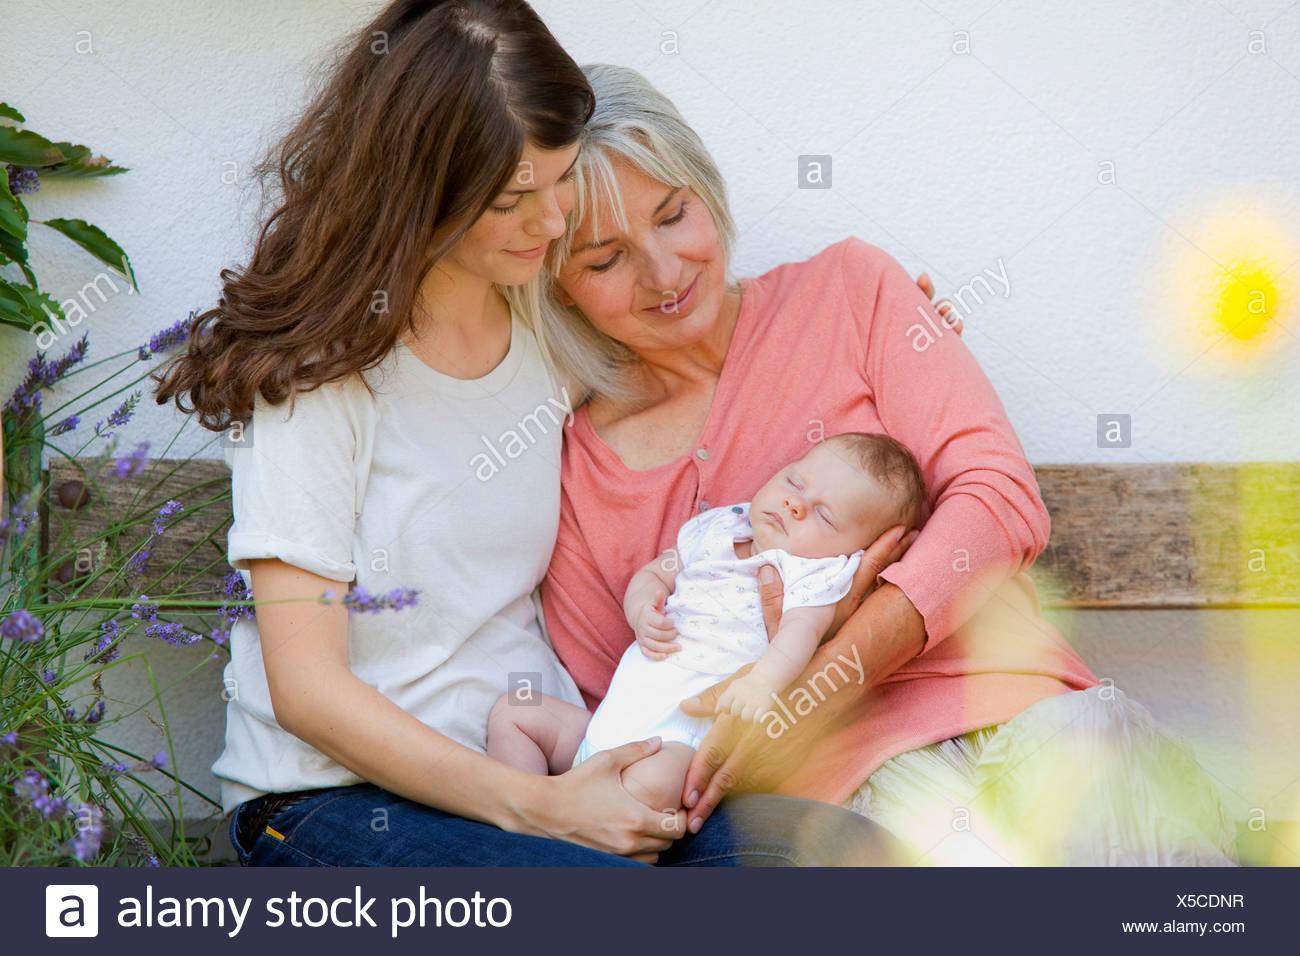 Germany, Bavaria, trois générations siégeant ensemble Photo Stock